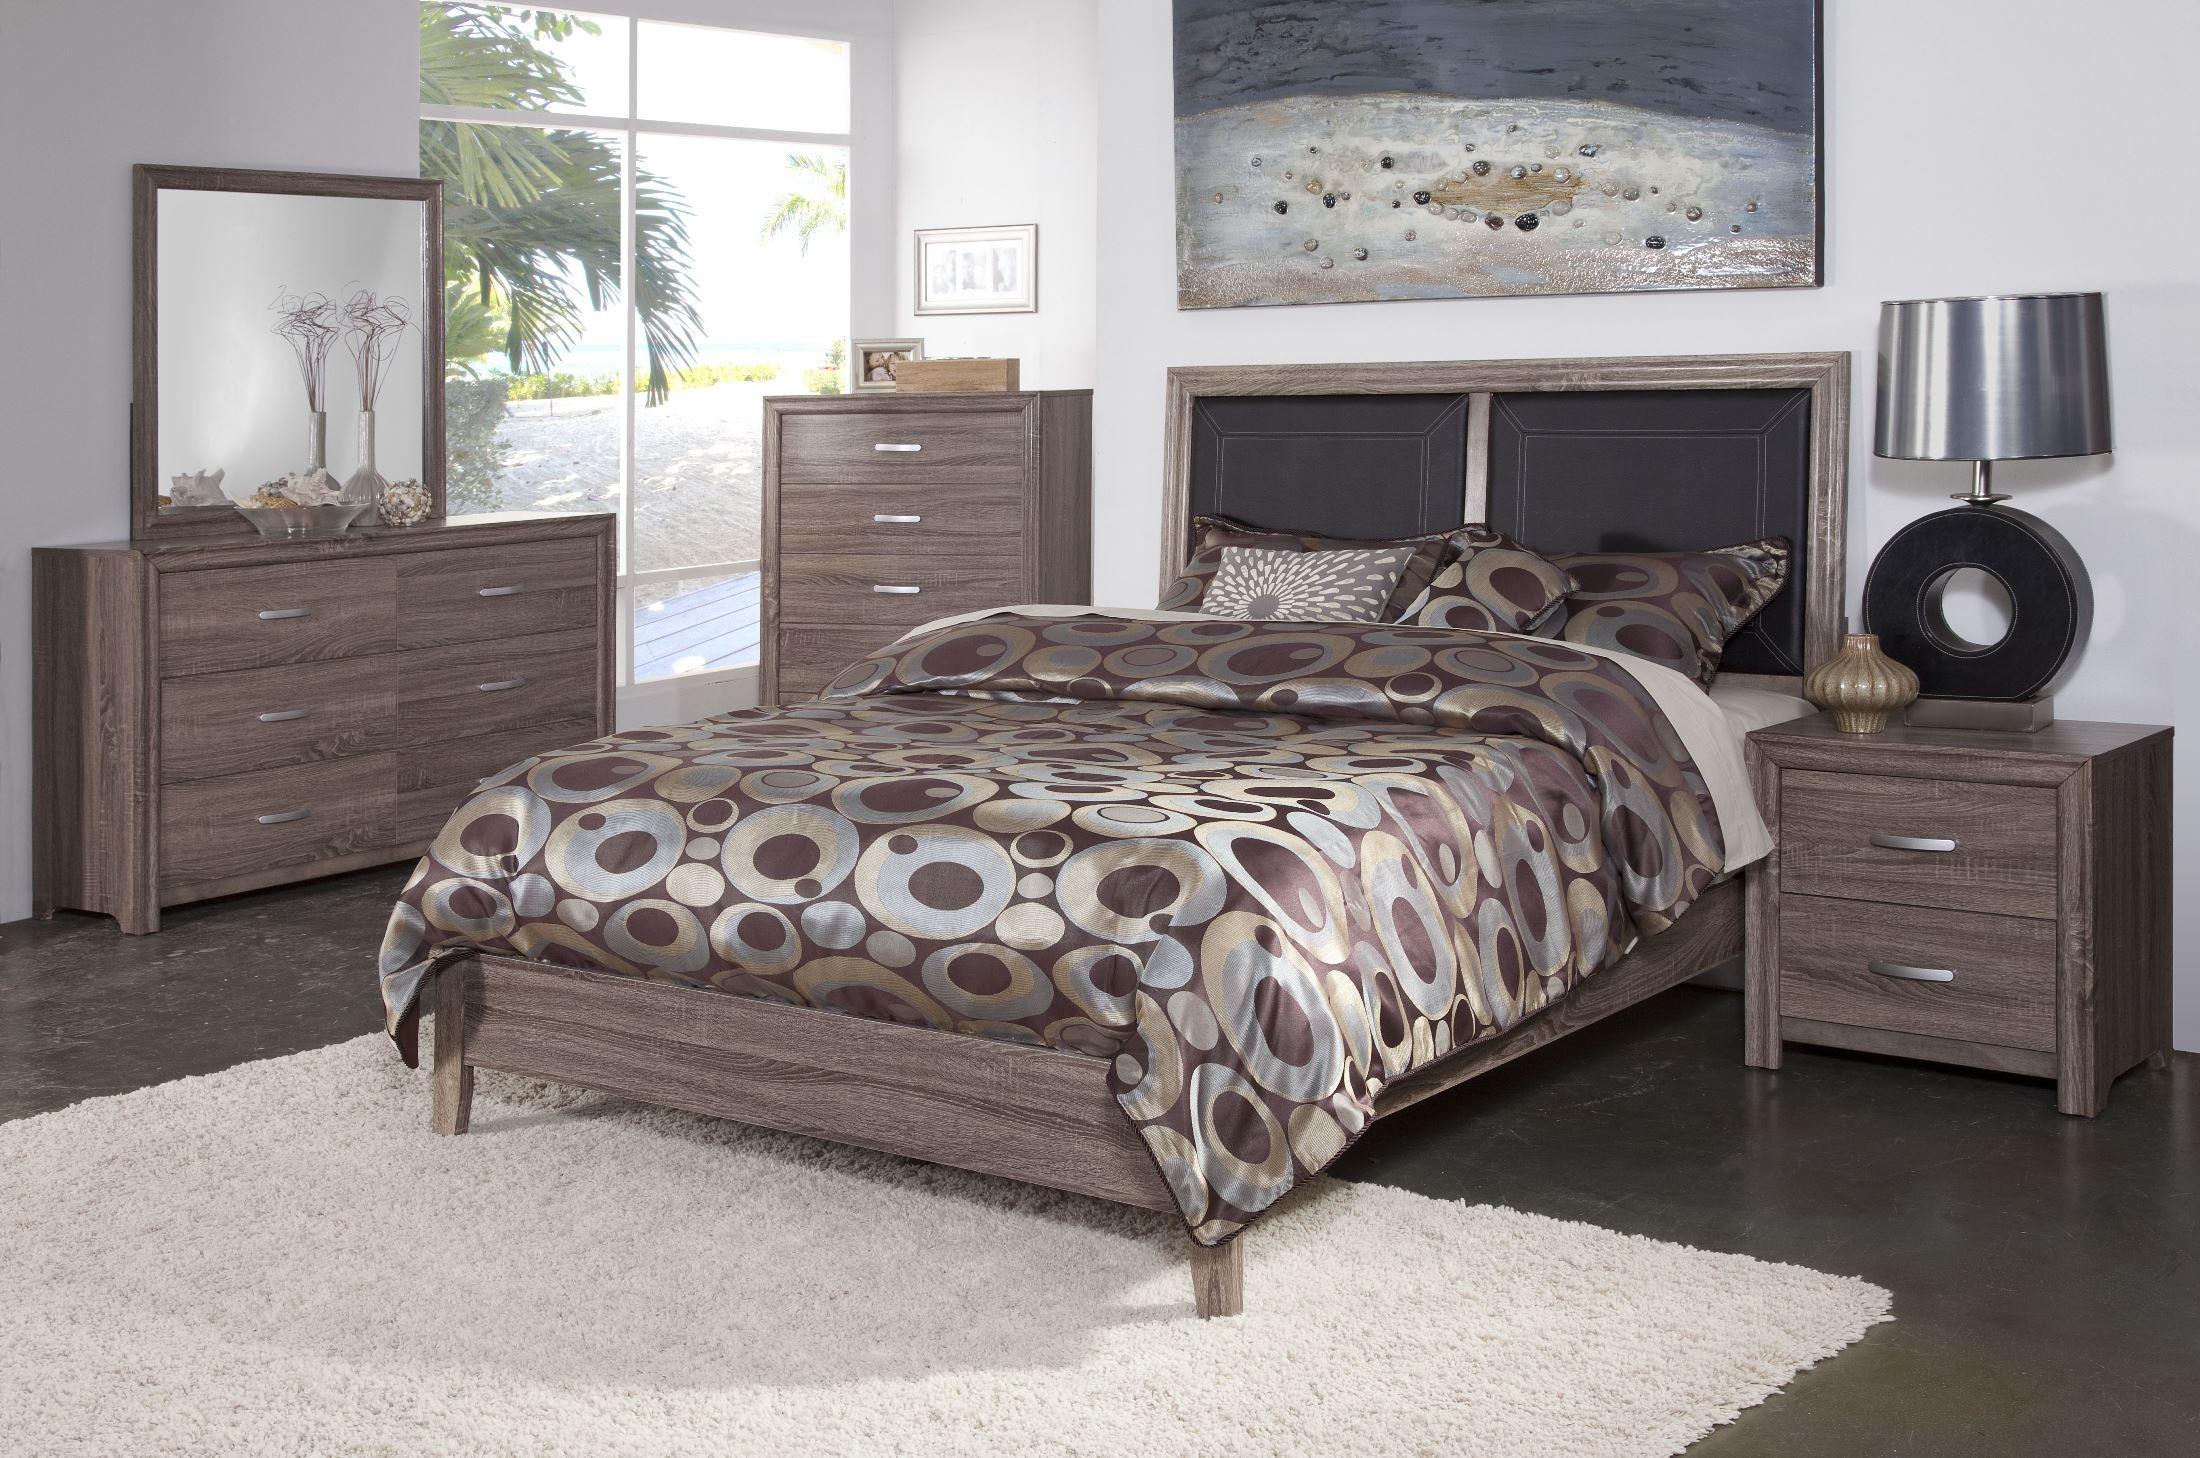 district 7 ash 3d youth platform bedroom set from new classics b1444 515 435 coleman furniture. Black Bedroom Furniture Sets. Home Design Ideas